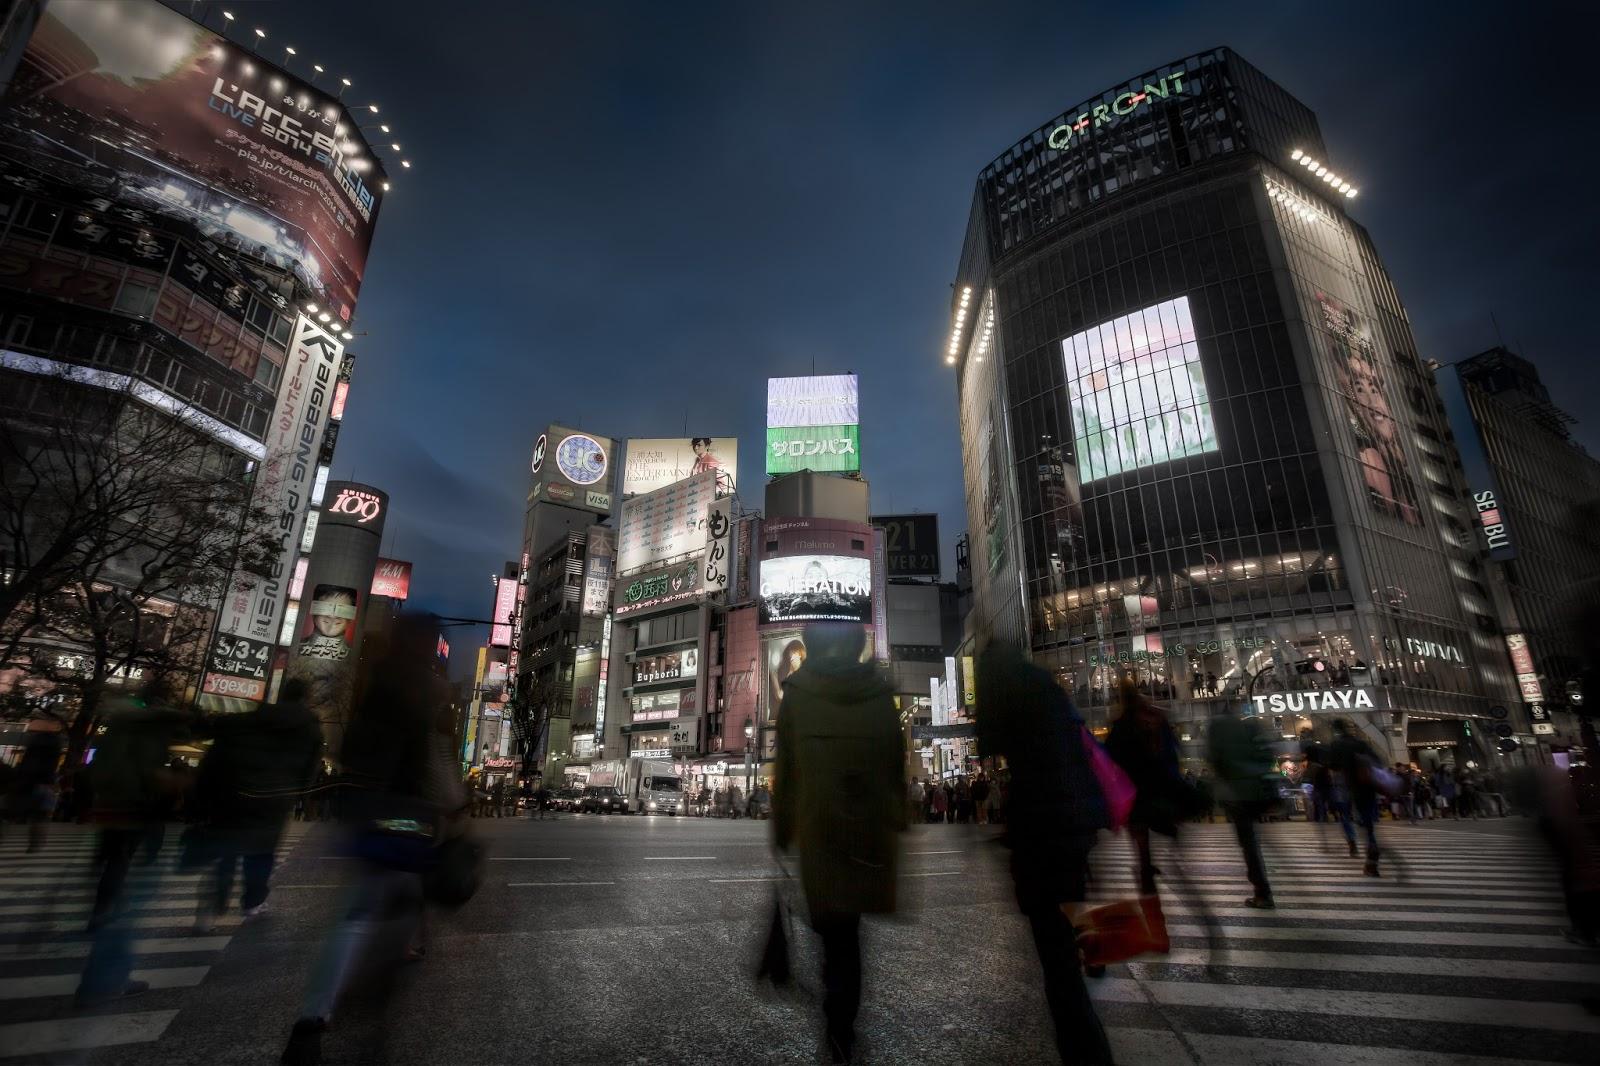 http://hsmithphotography.smugmug.com/LandScapes/Japan/i-4pjCWCc/A